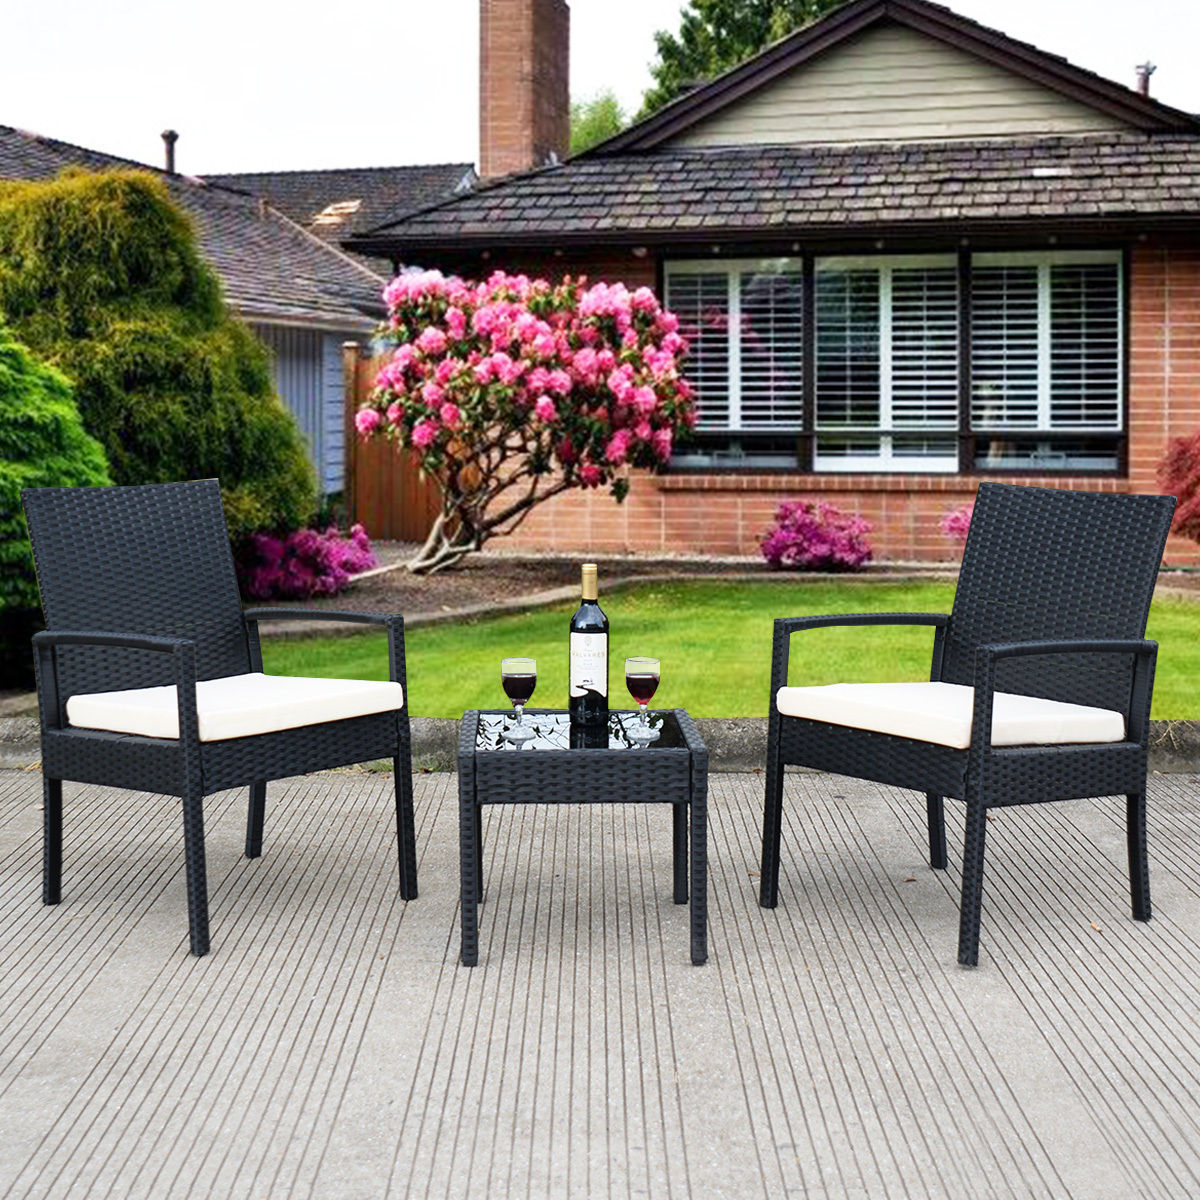 DEAL!!! 3 PS Outdoor Rattan Patio Furniture Set Backyard Garden Furniture